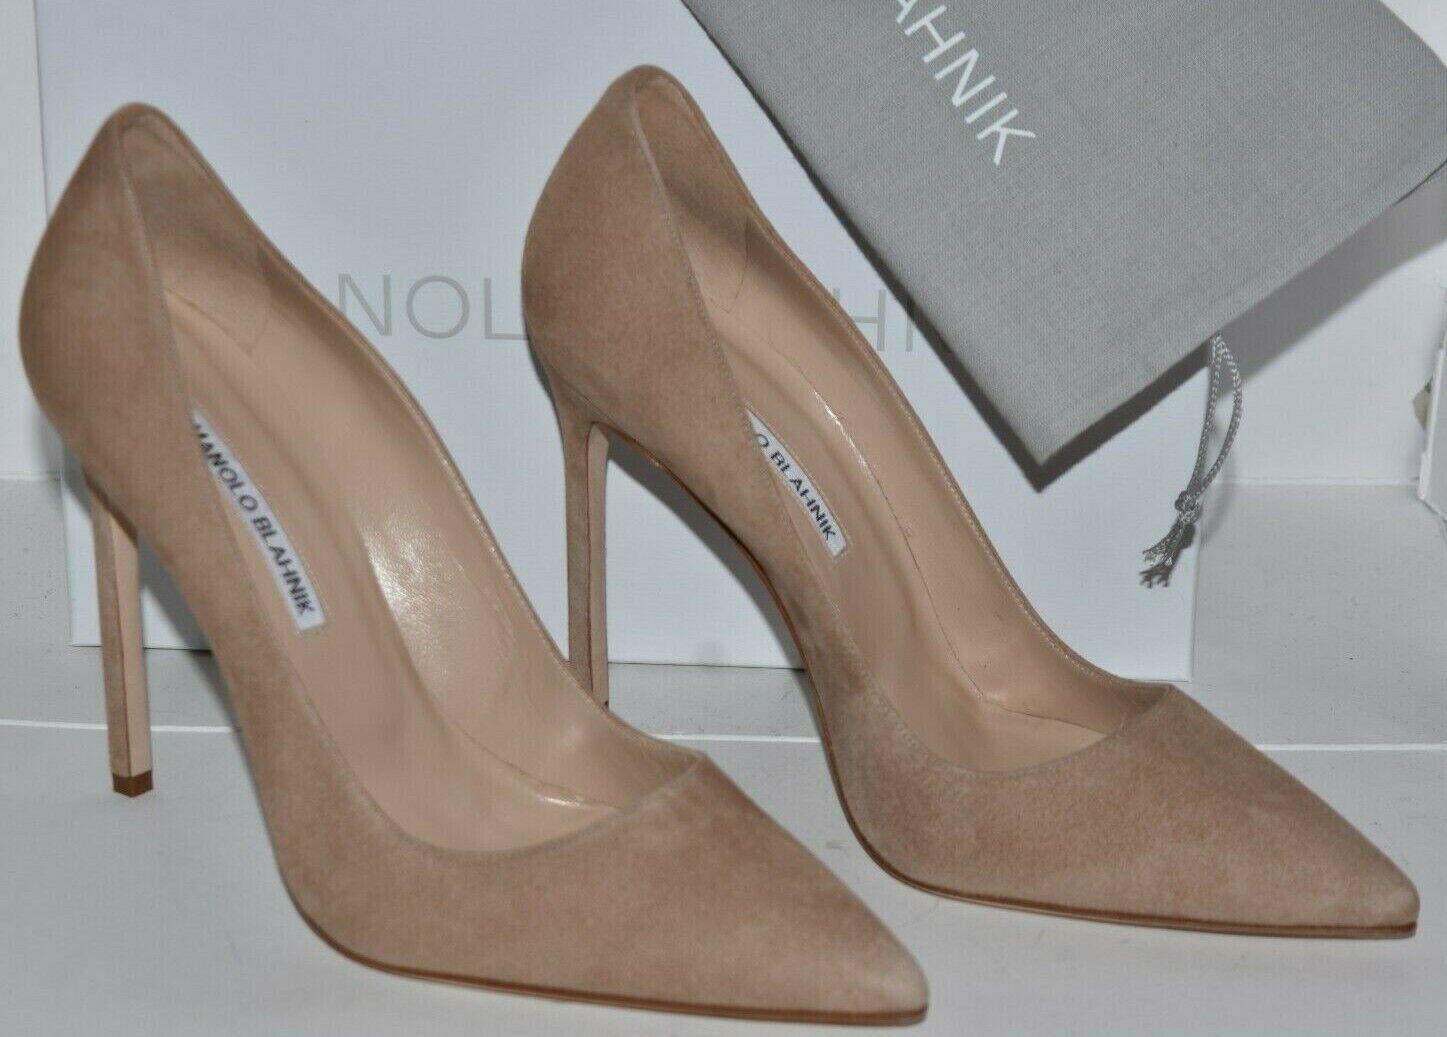 NEW Manolo Blahnik BB 115 Suede NUDE Beige Pumps Heels Shoes 39 405 415